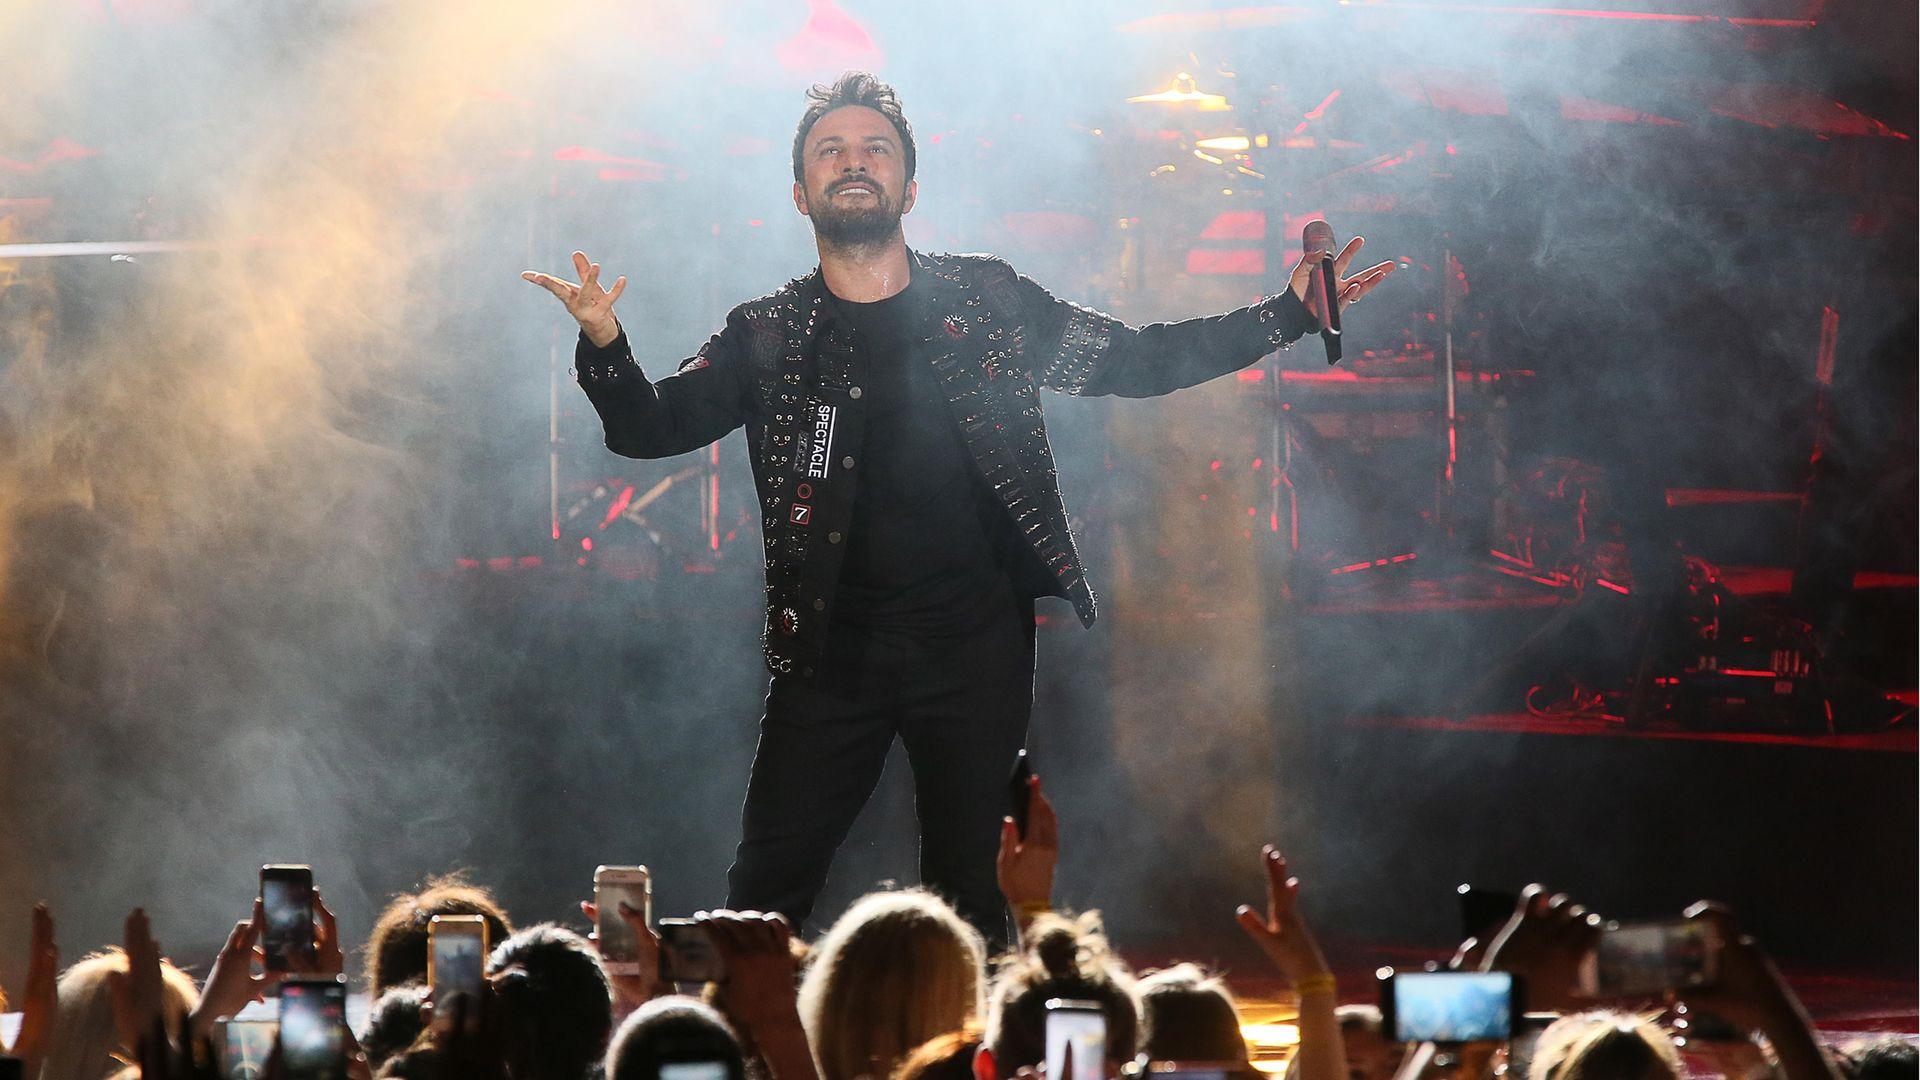 Turkish singer Tarkan during a concert in Moscow in 2019 - Credit: Vladimir Gerdo/TASS